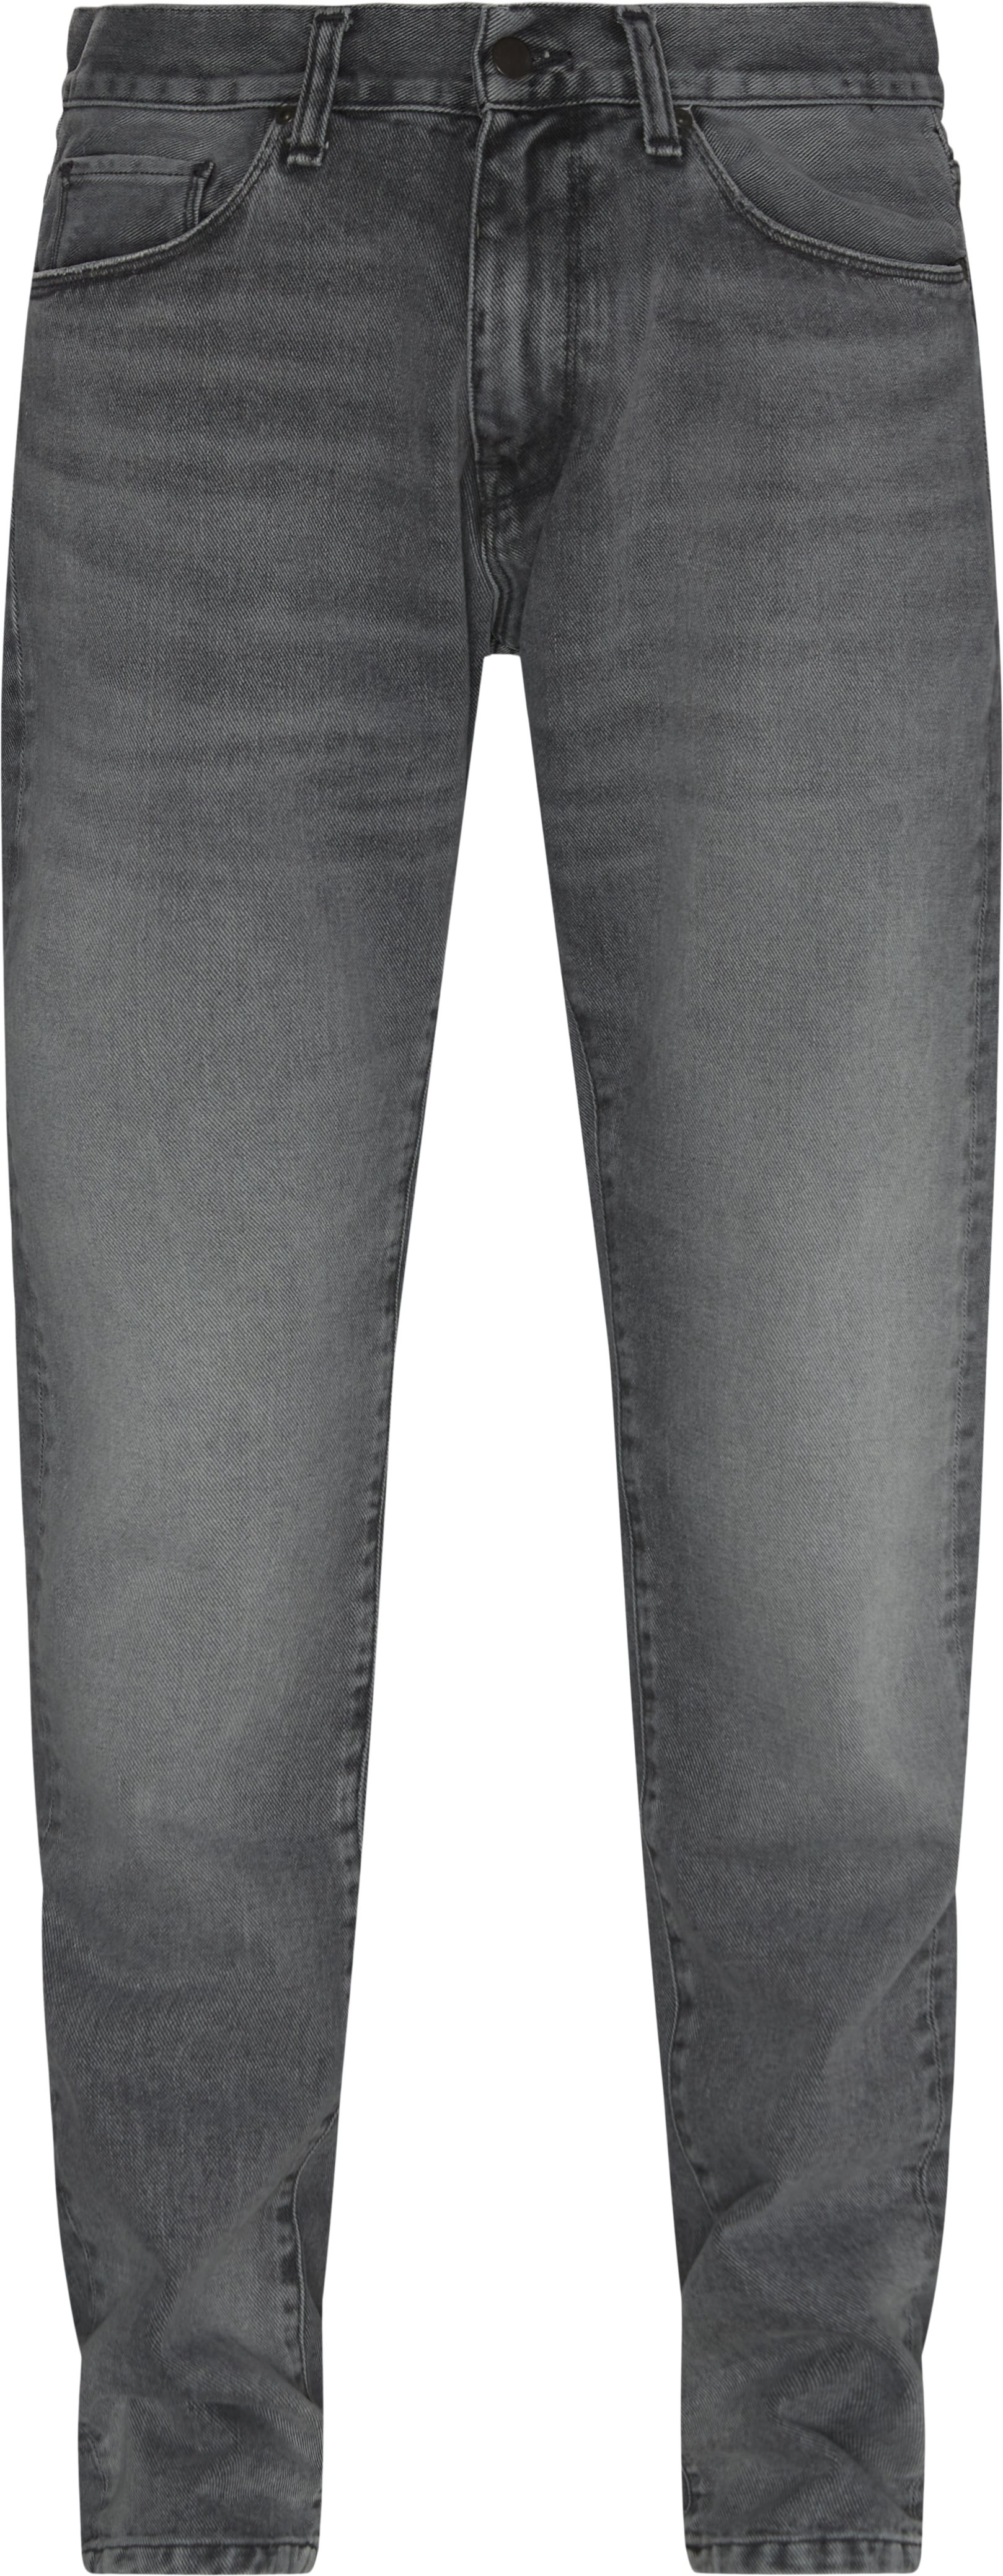 Jeans - Tapered fit - Svart